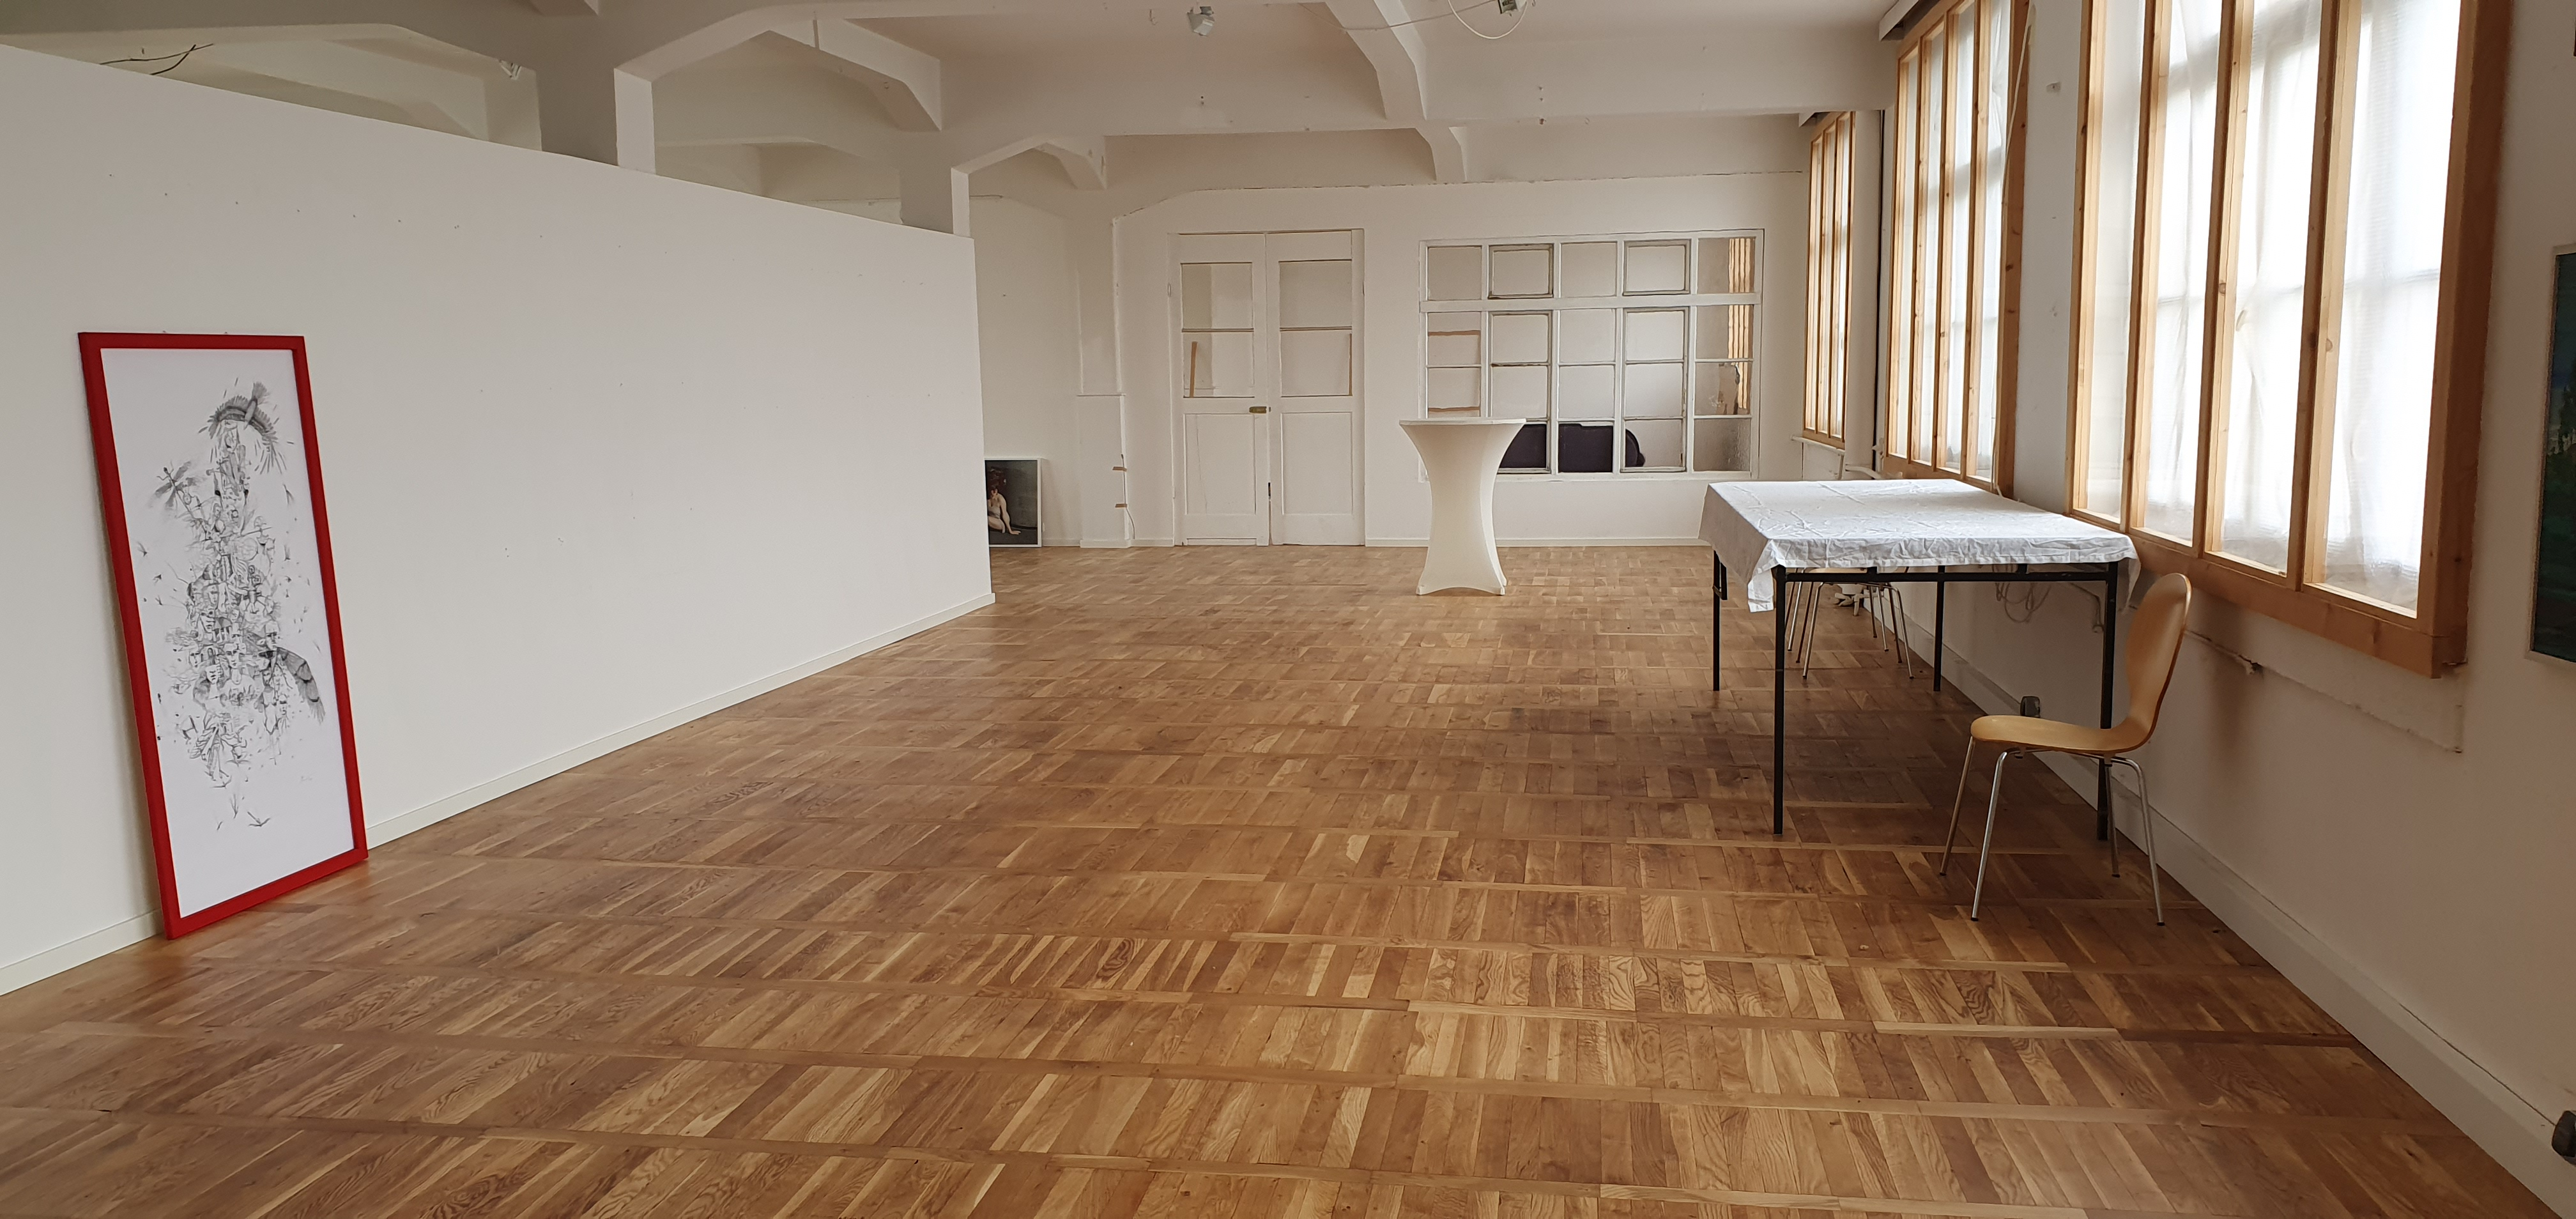 Kulturfabrik Apolda: Sanierung Fußboden im 2.OG (RAG Weimarer Land - Mittelthüringen e.V.)